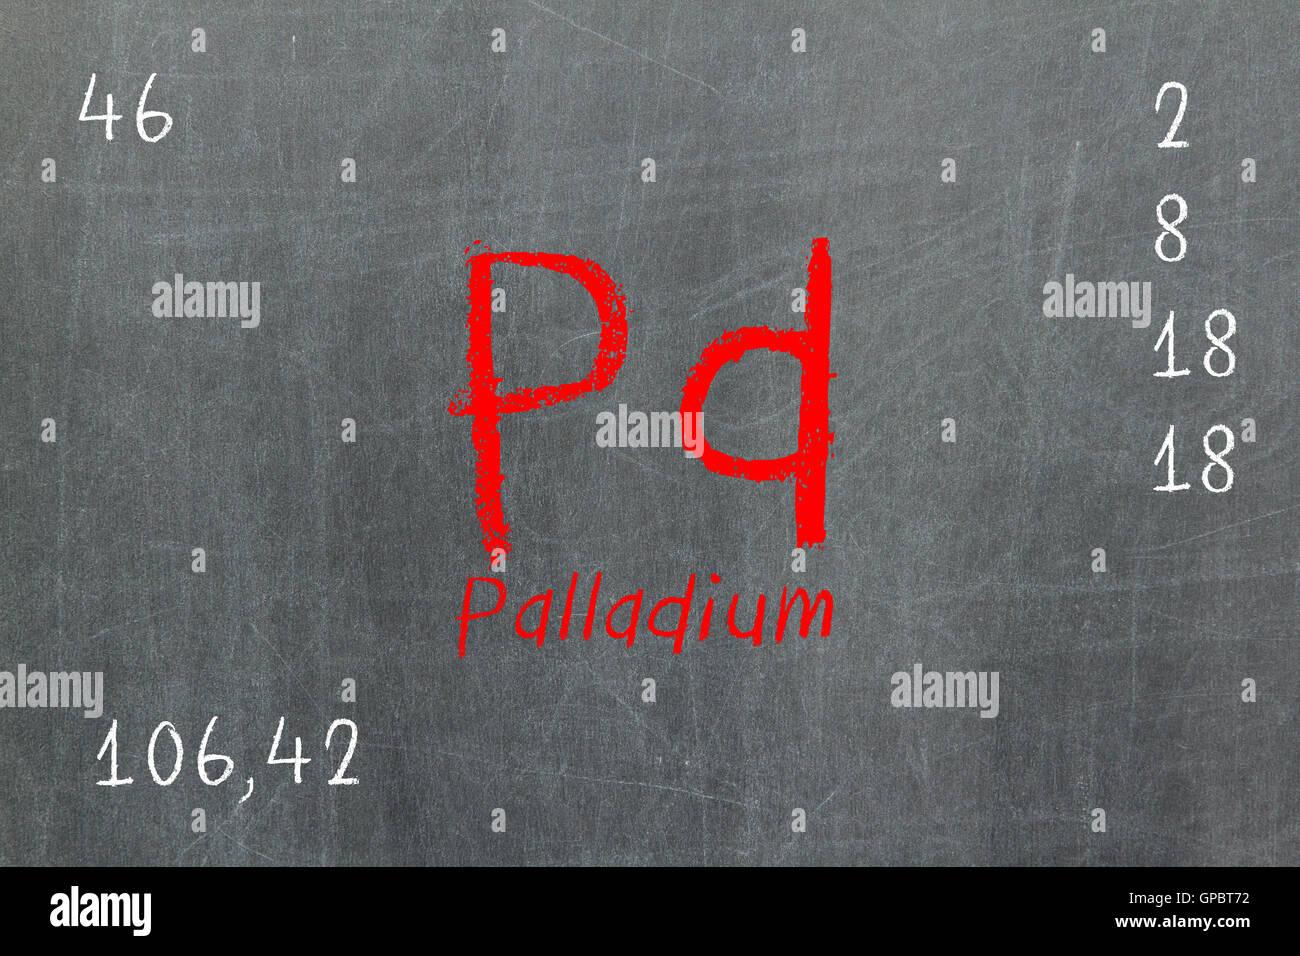 Palladium Metal Stock Photos Palladium Metal Stock Images Alamy